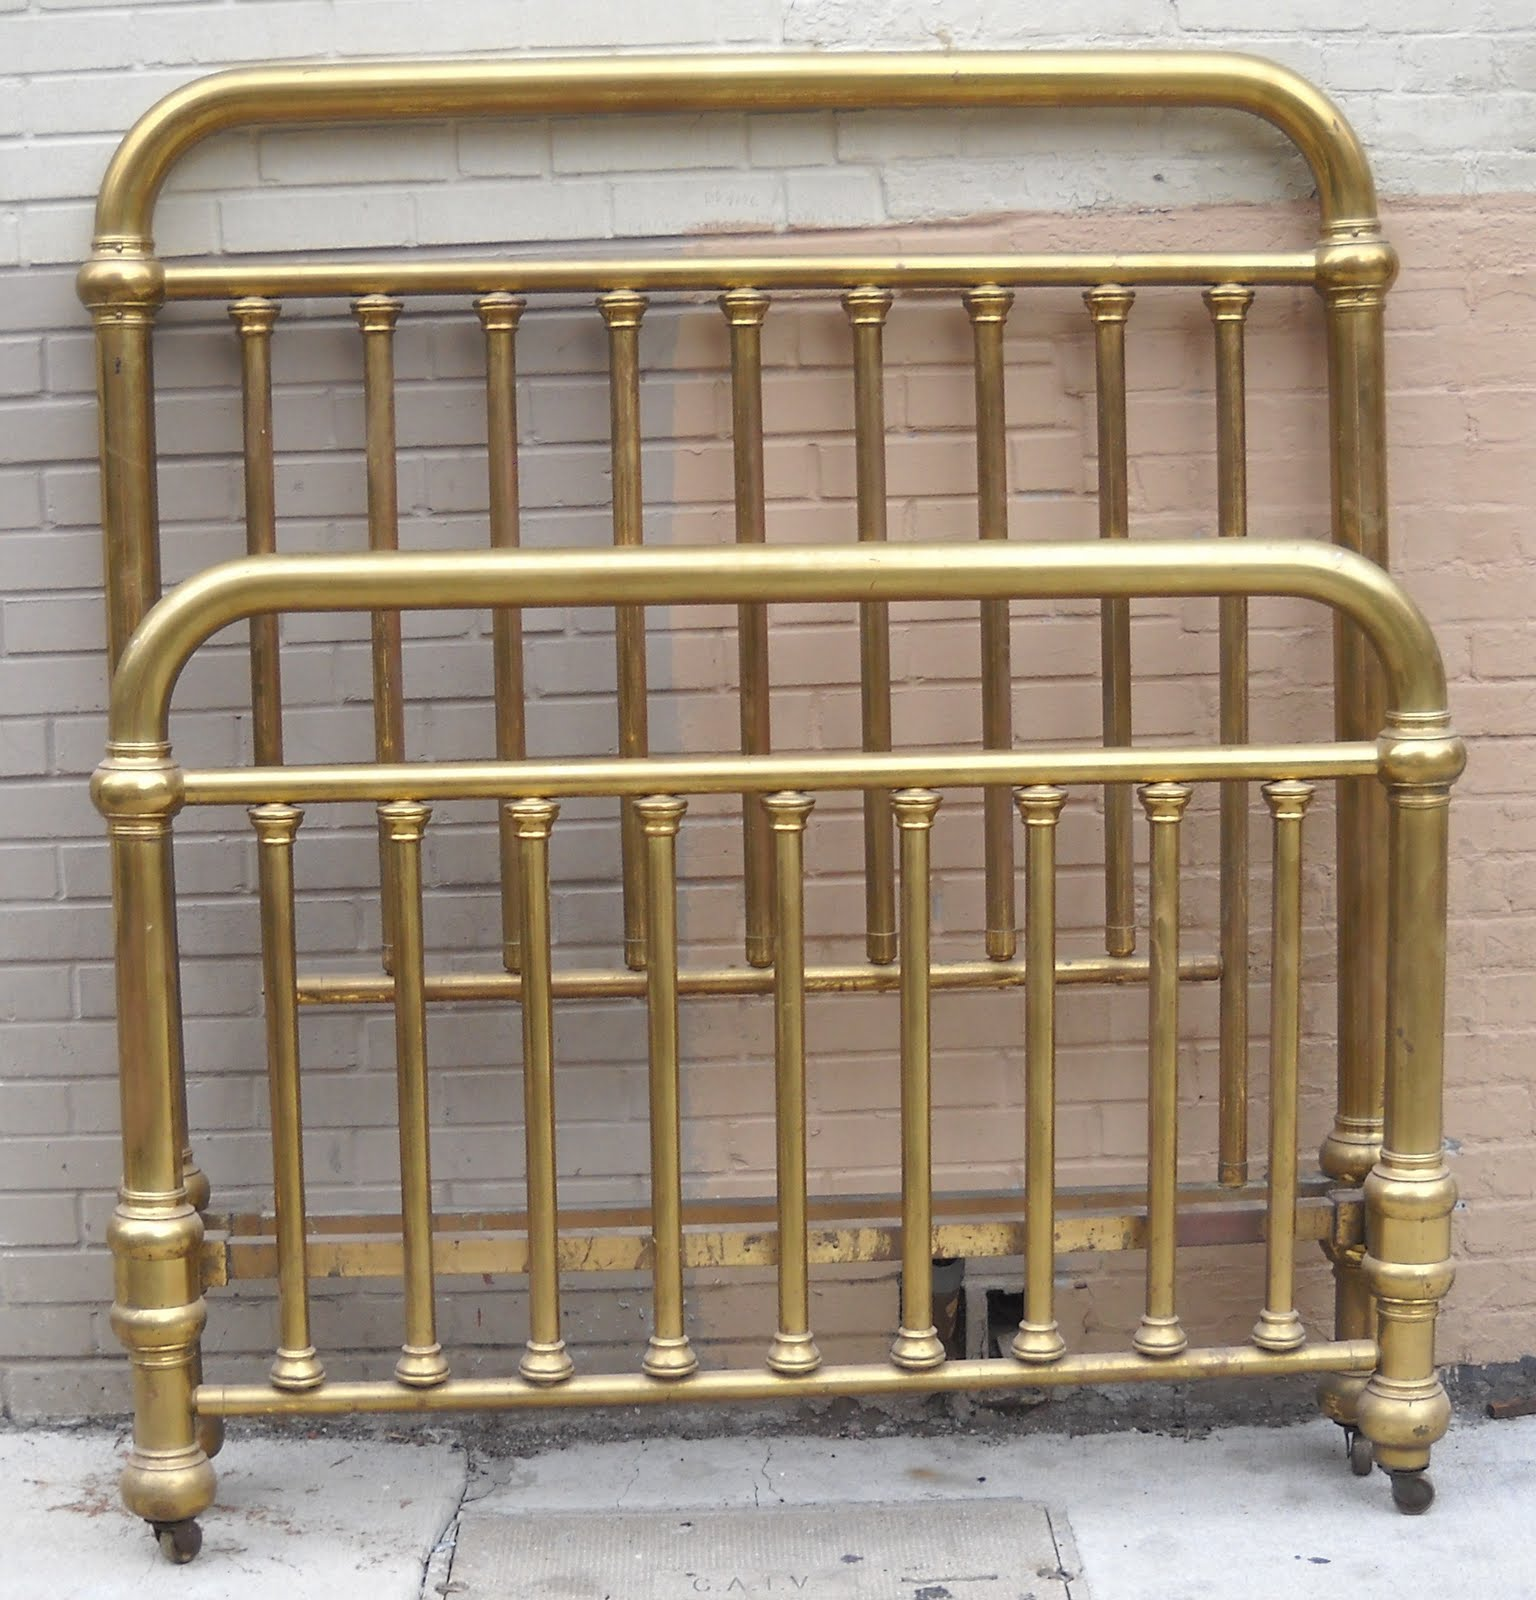 Uhuru Furniture & Collectibles: LISA'S PICK! Antique Brass